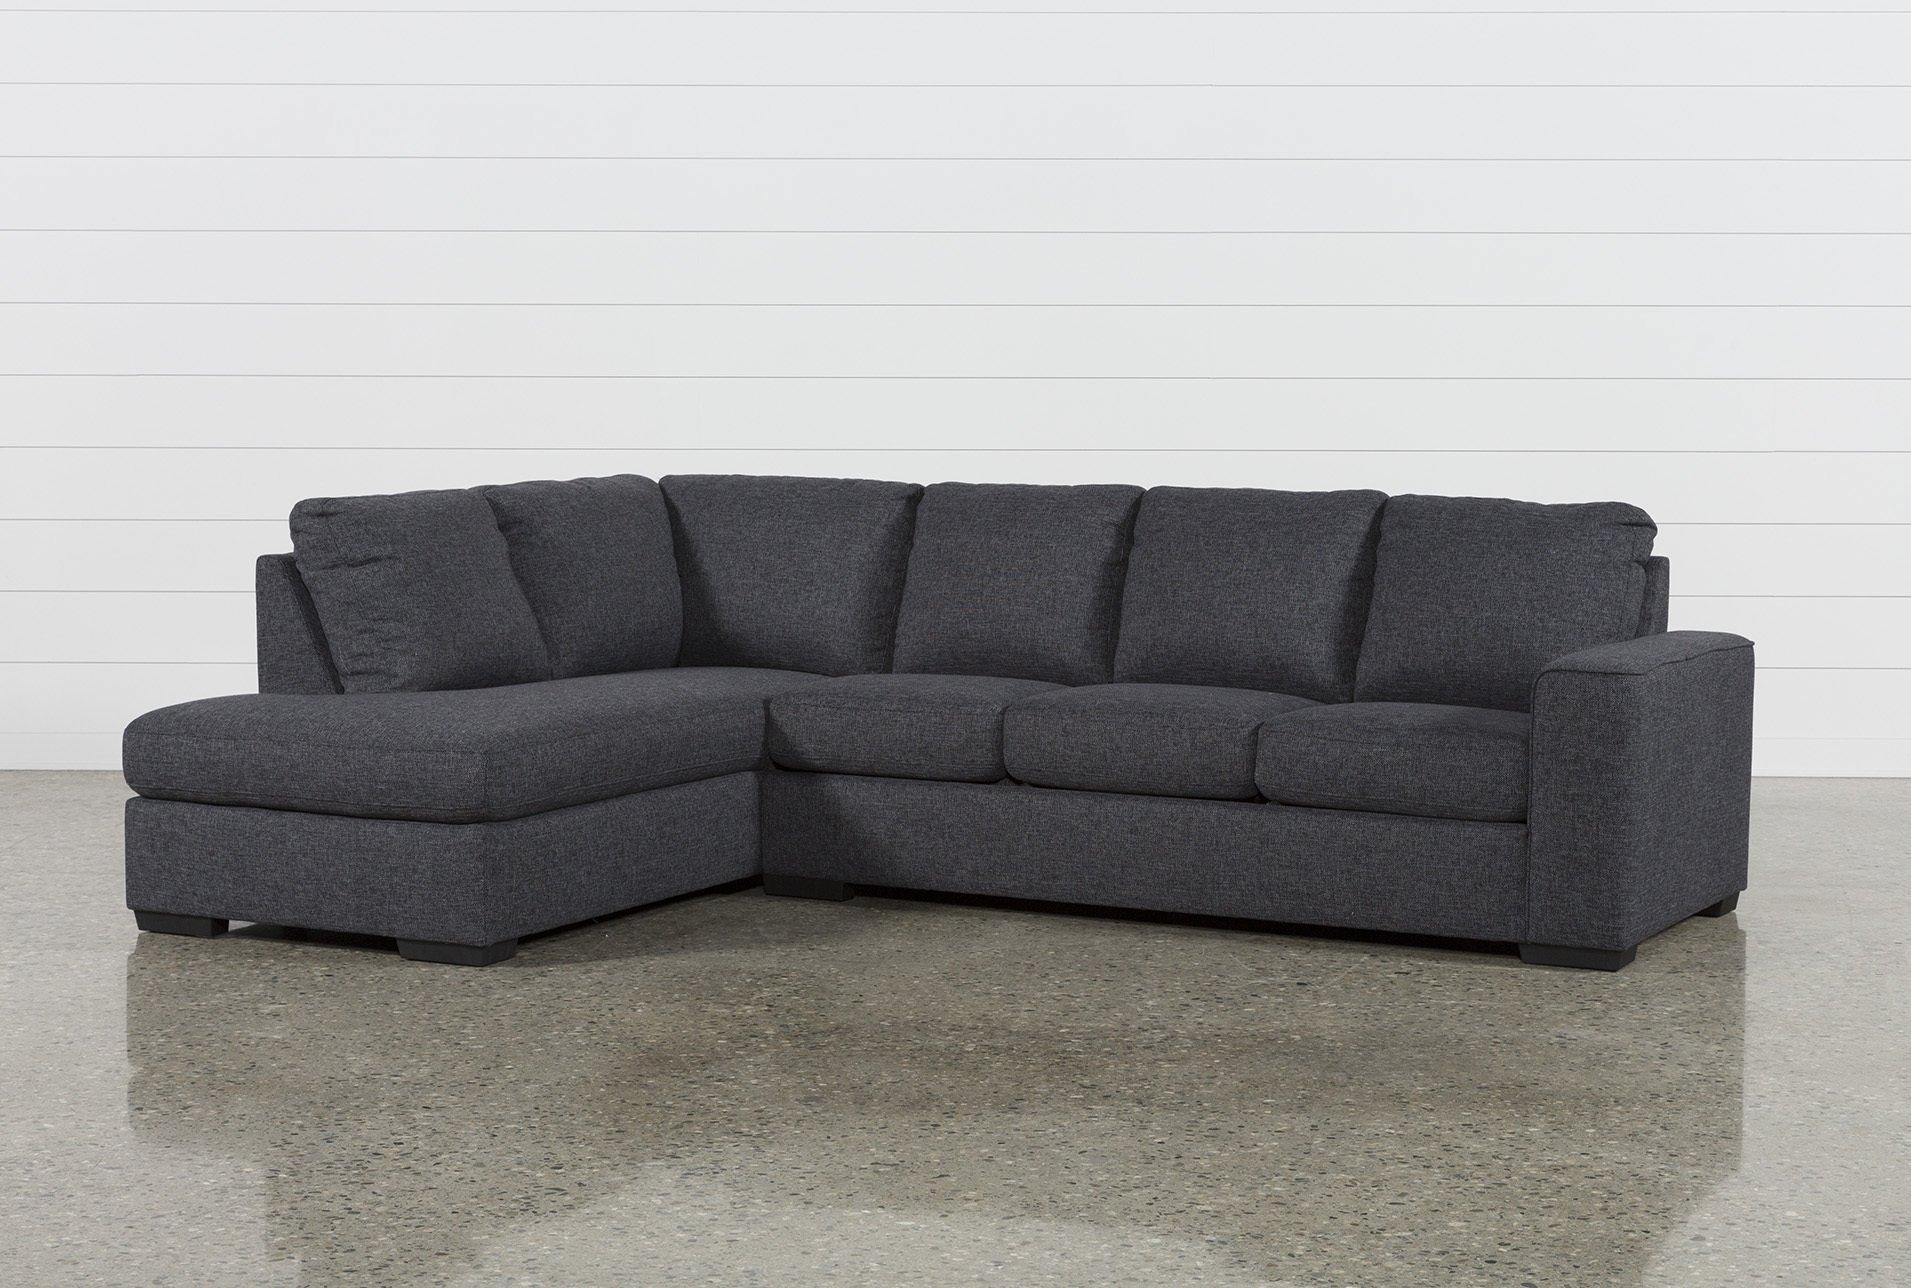 Lucy Dark Grey 2 Piece Sectional W/laf Chaise | Dark Grey And Products regarding Aquarius Dark Grey 2 Piece Sectionals With Laf Chaise (Image 19 of 30)